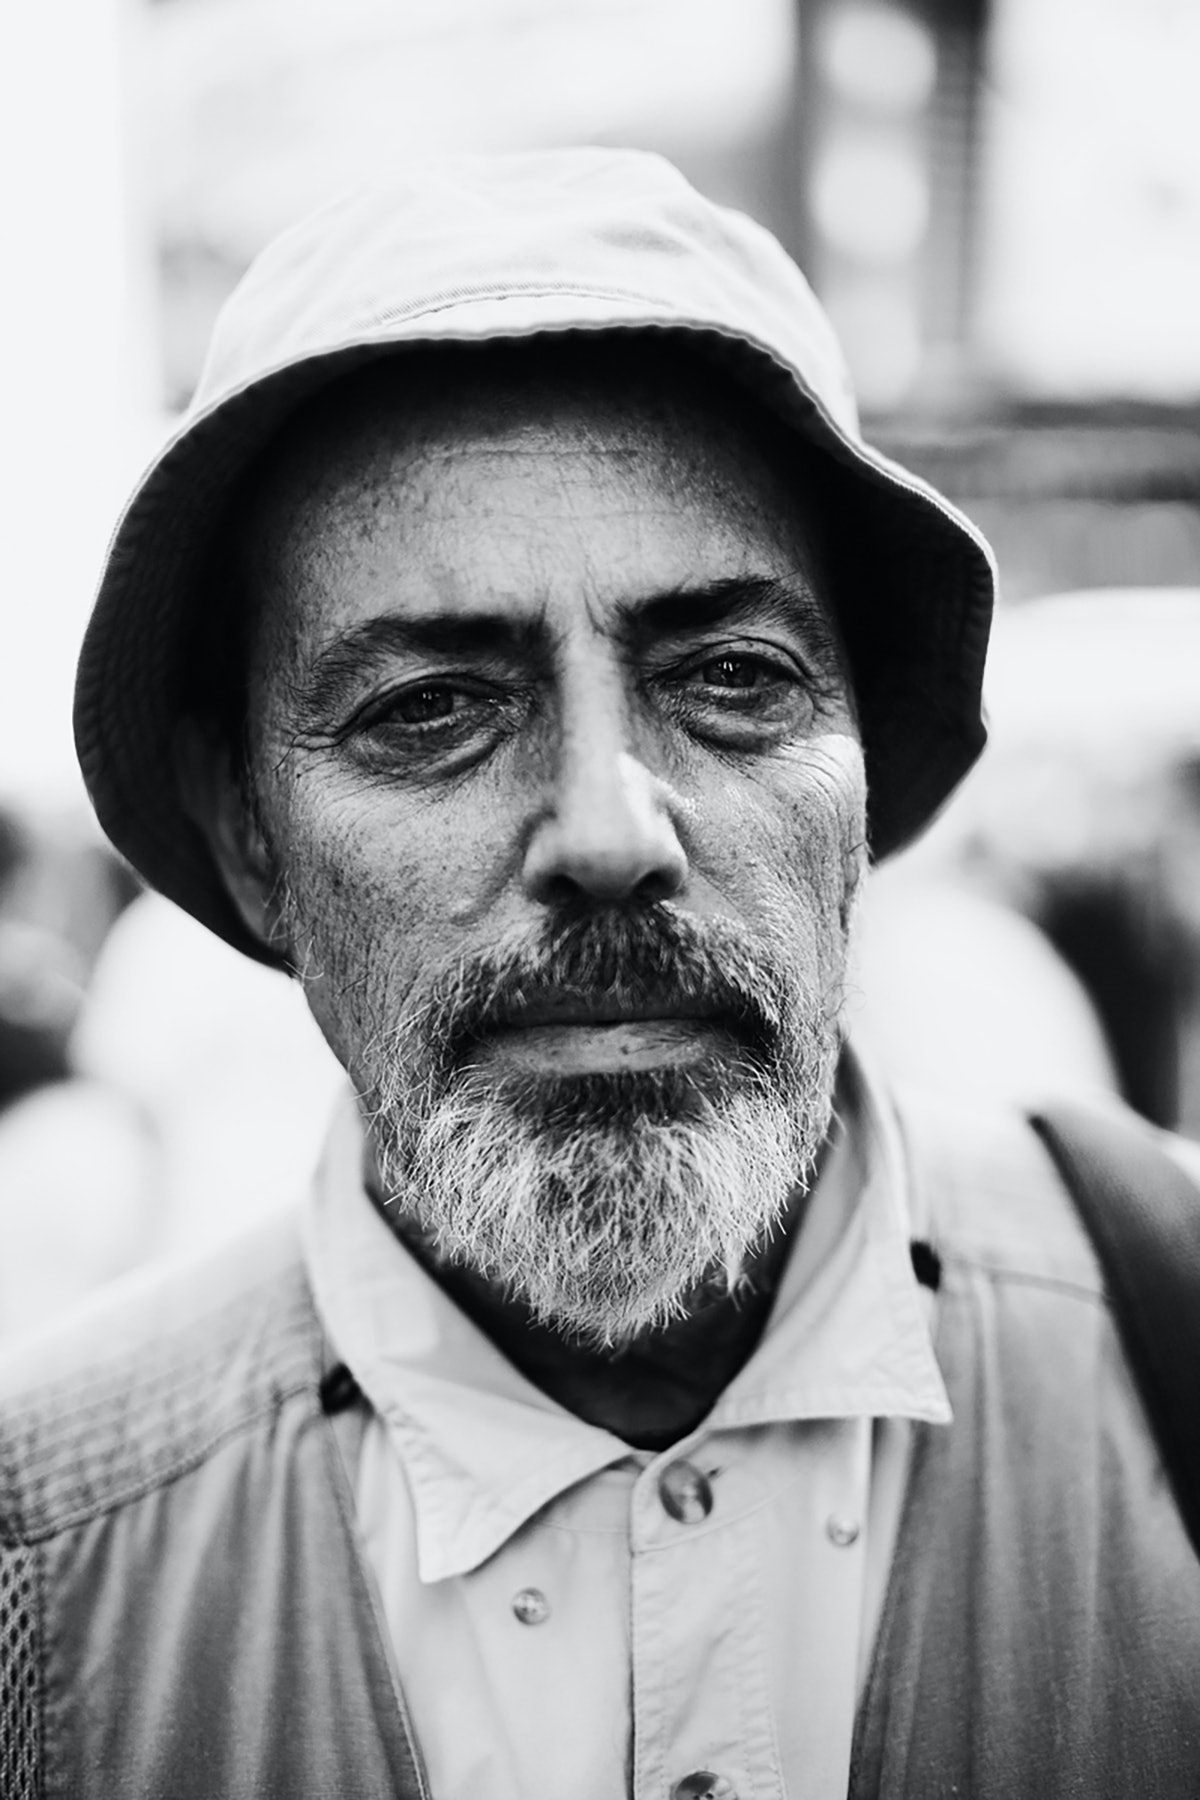 Bruce Gilden, New York City, 2011